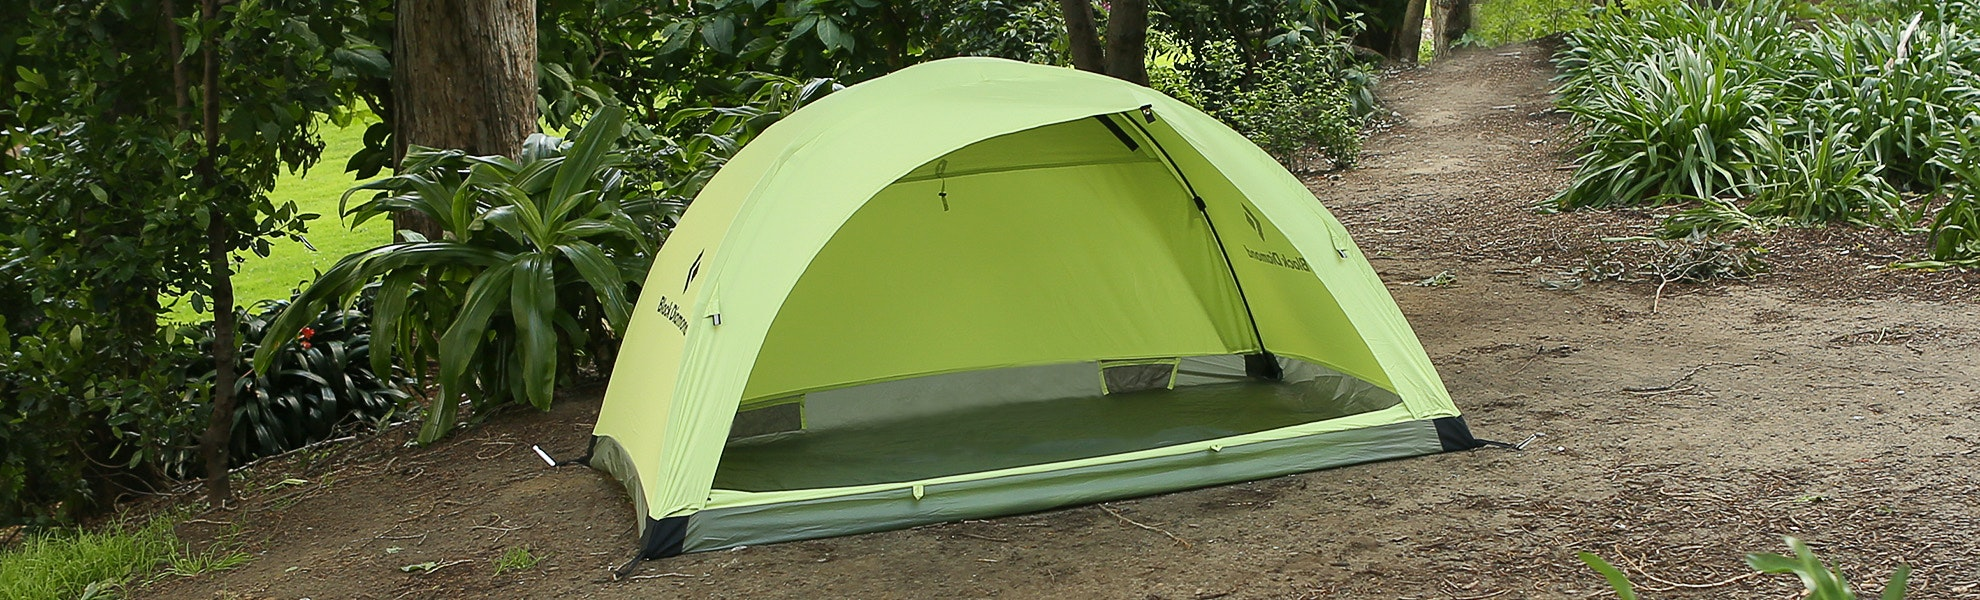 Black Diamond HiLight Tent & Black Diamond HiLight Tent | Price u0026 Reviews | Massdrop